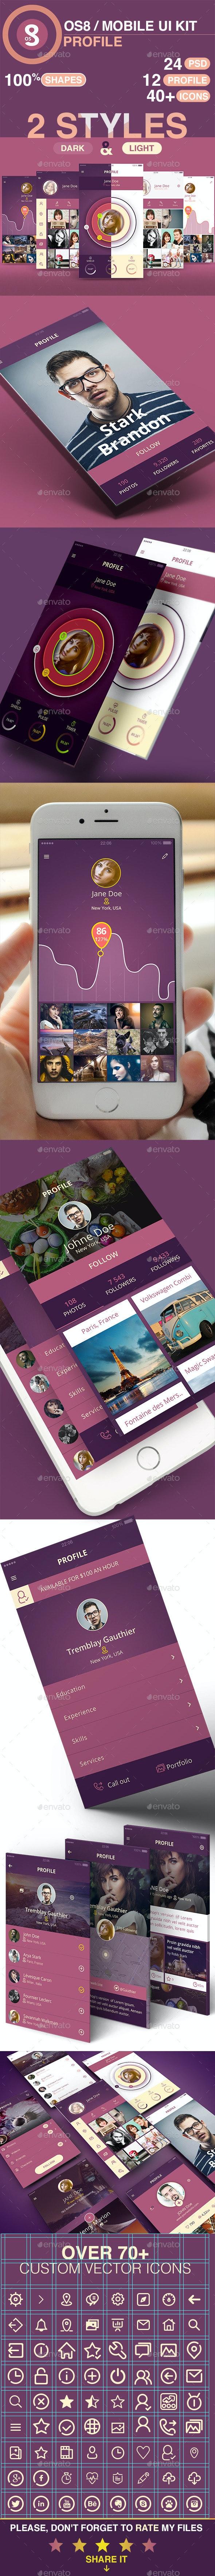 Profile / Mobile UI Kit - User Interfaces Web Elements